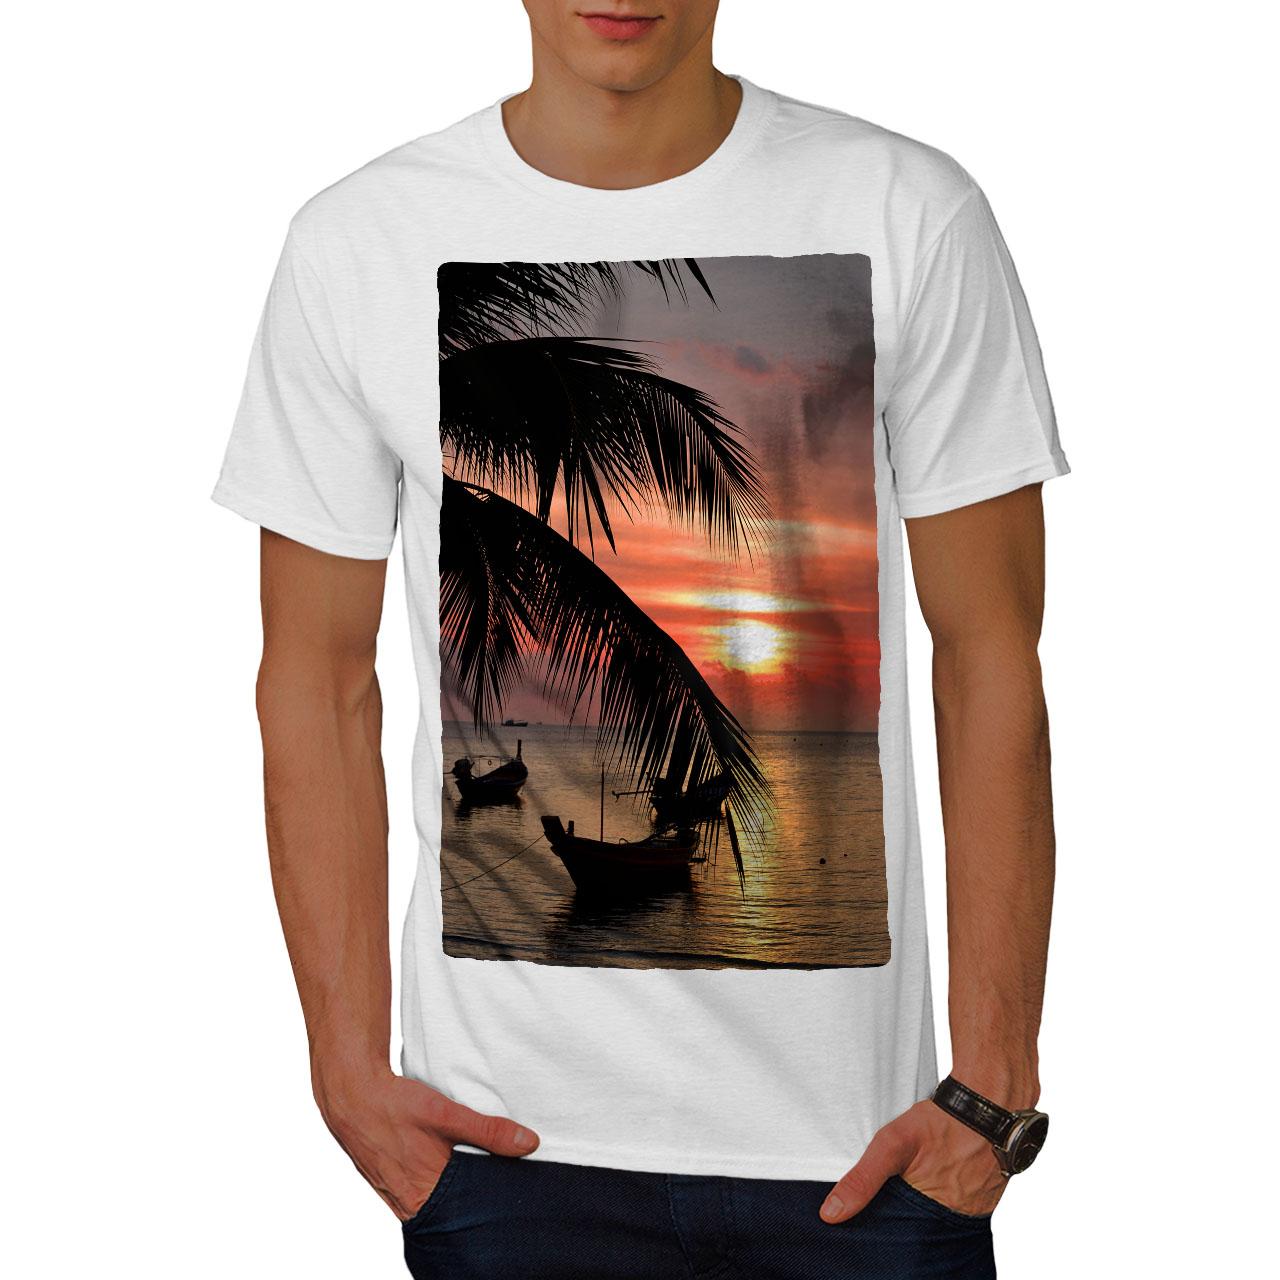 Wellcoda-Sunset-Palm-Tree-Mens-T-shirt-Ocean-Beach-Graphic-Design-Printed-Tee thumbnail 9